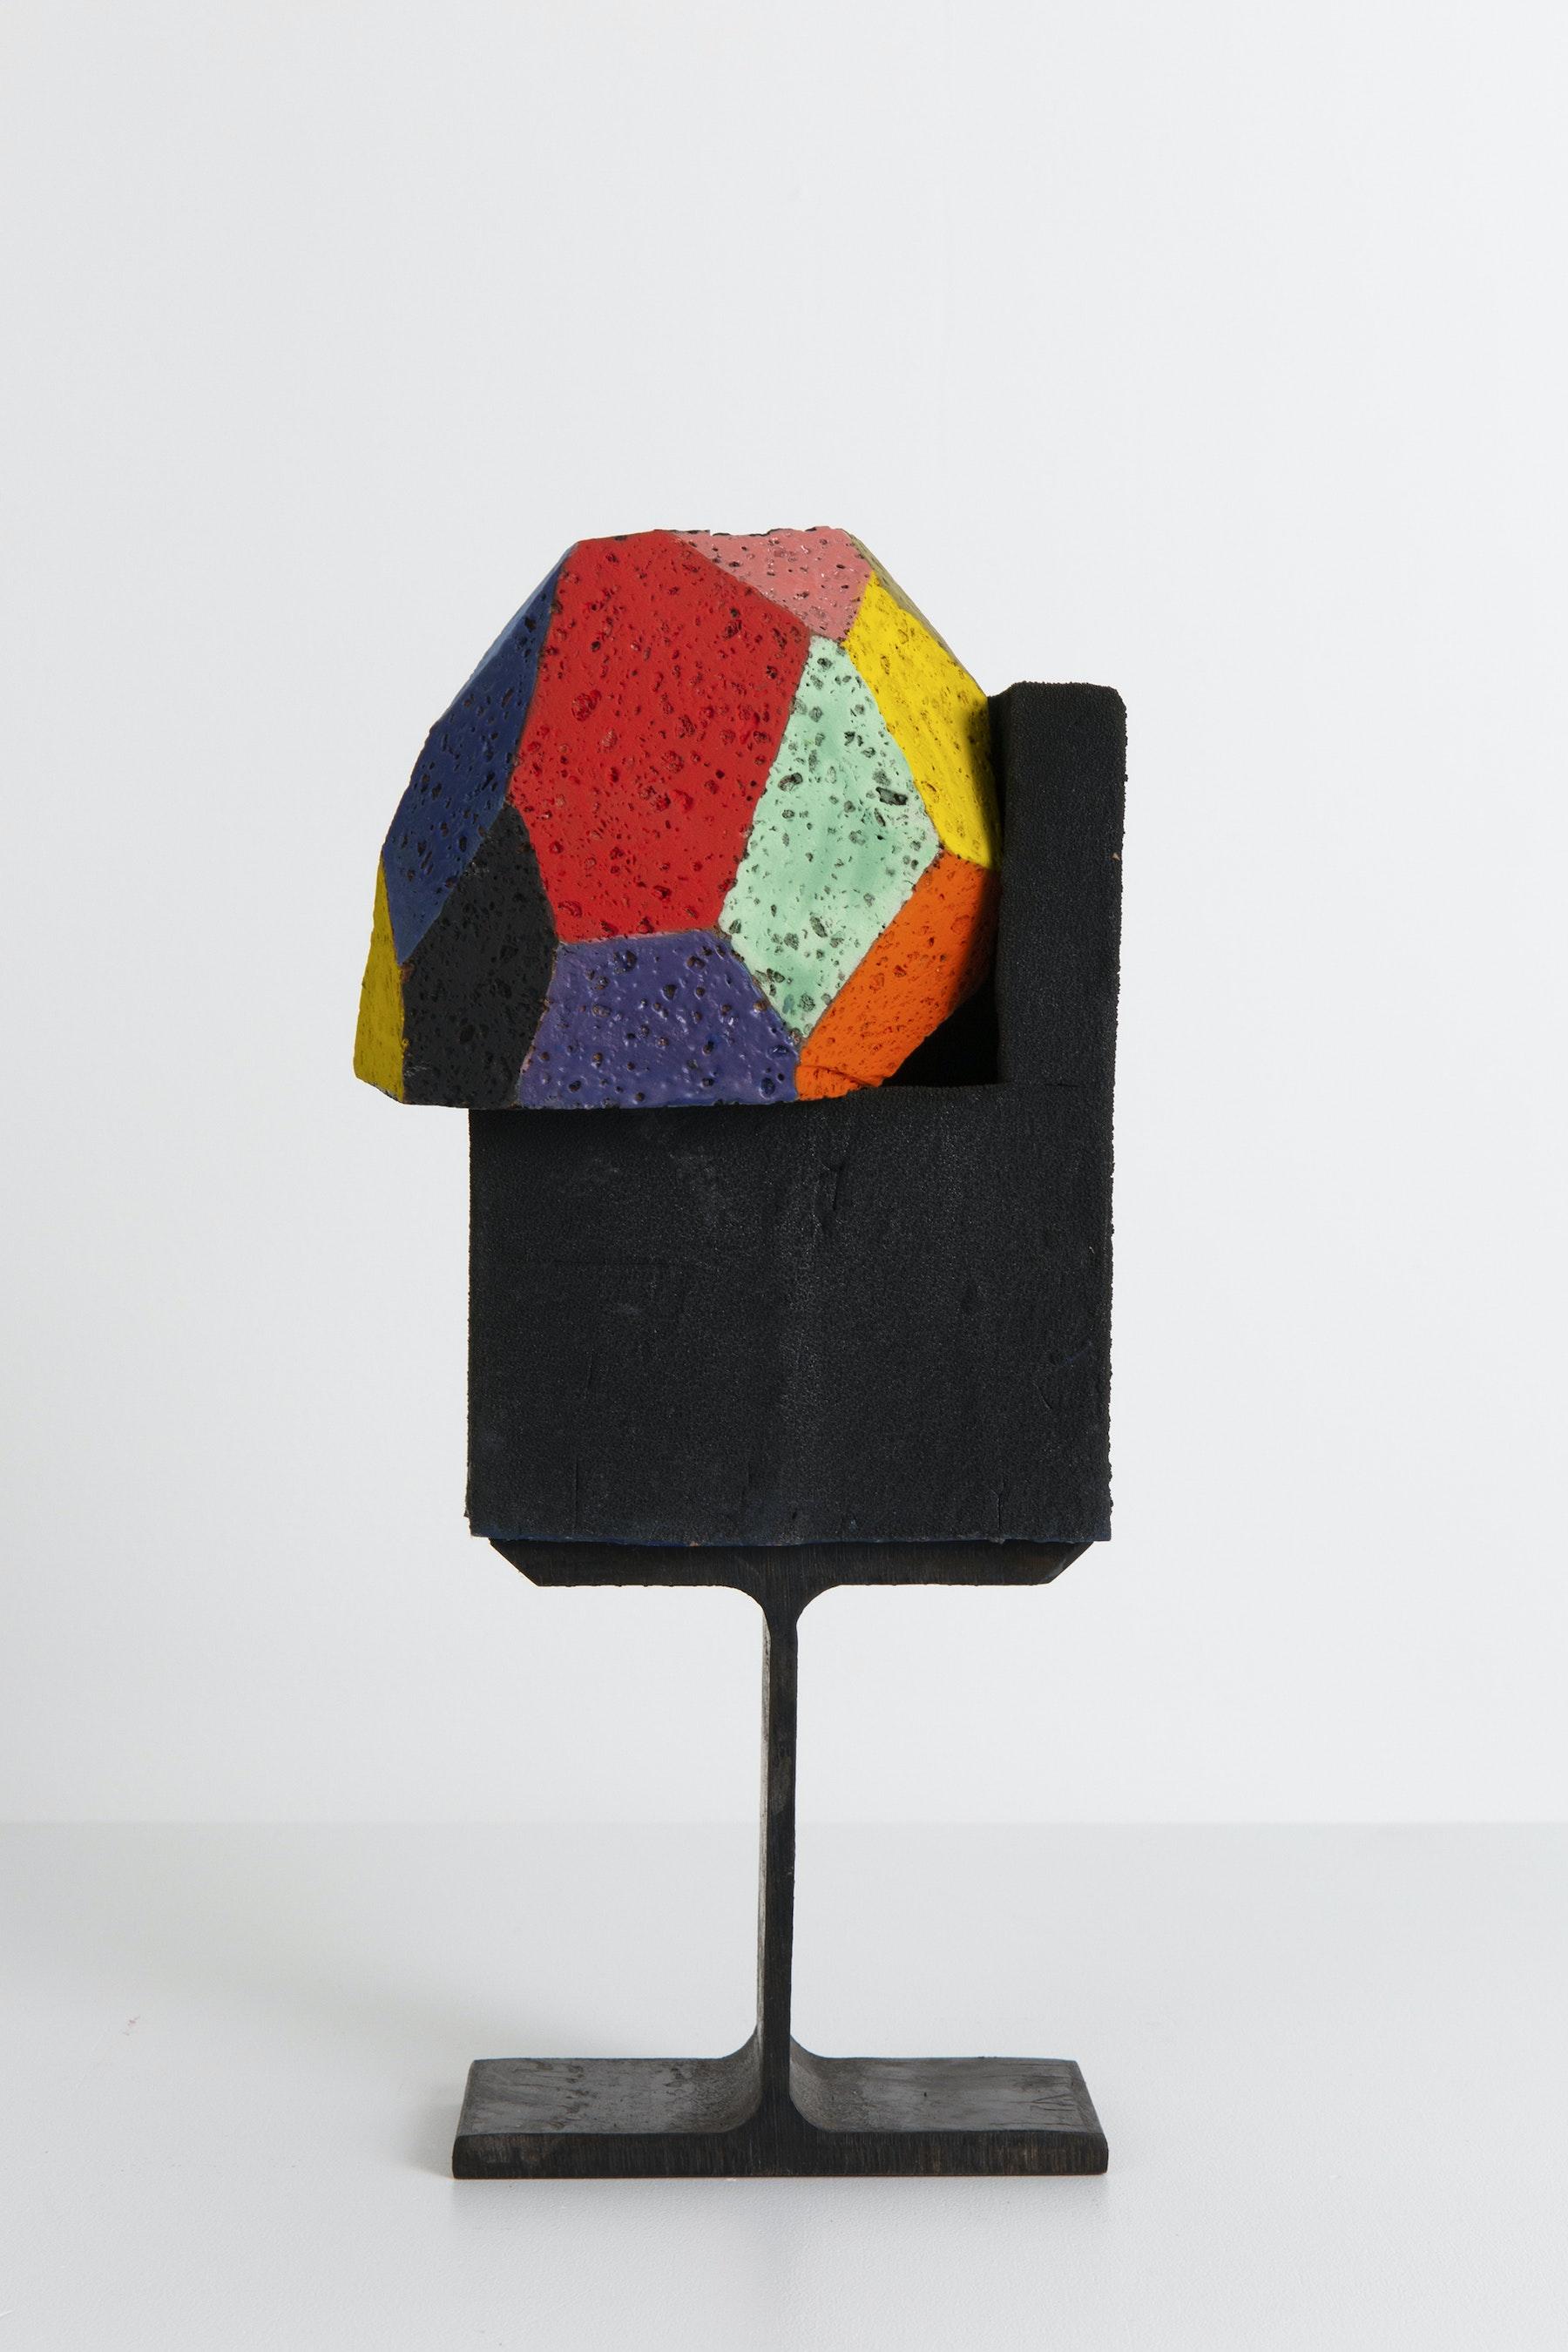 "Arlene Shechet ""Cure,"" 2020 Glazed ceramic, steel 13.25 x 6 x 5.25"" [HxWxD] (33.65 x 15.24 x 13.33 cm) Inventory #SHE159 Courtesy of the artist and Vielmetter Los Angeles. © Arlene Shechet Photo credit: Eva Deitch"